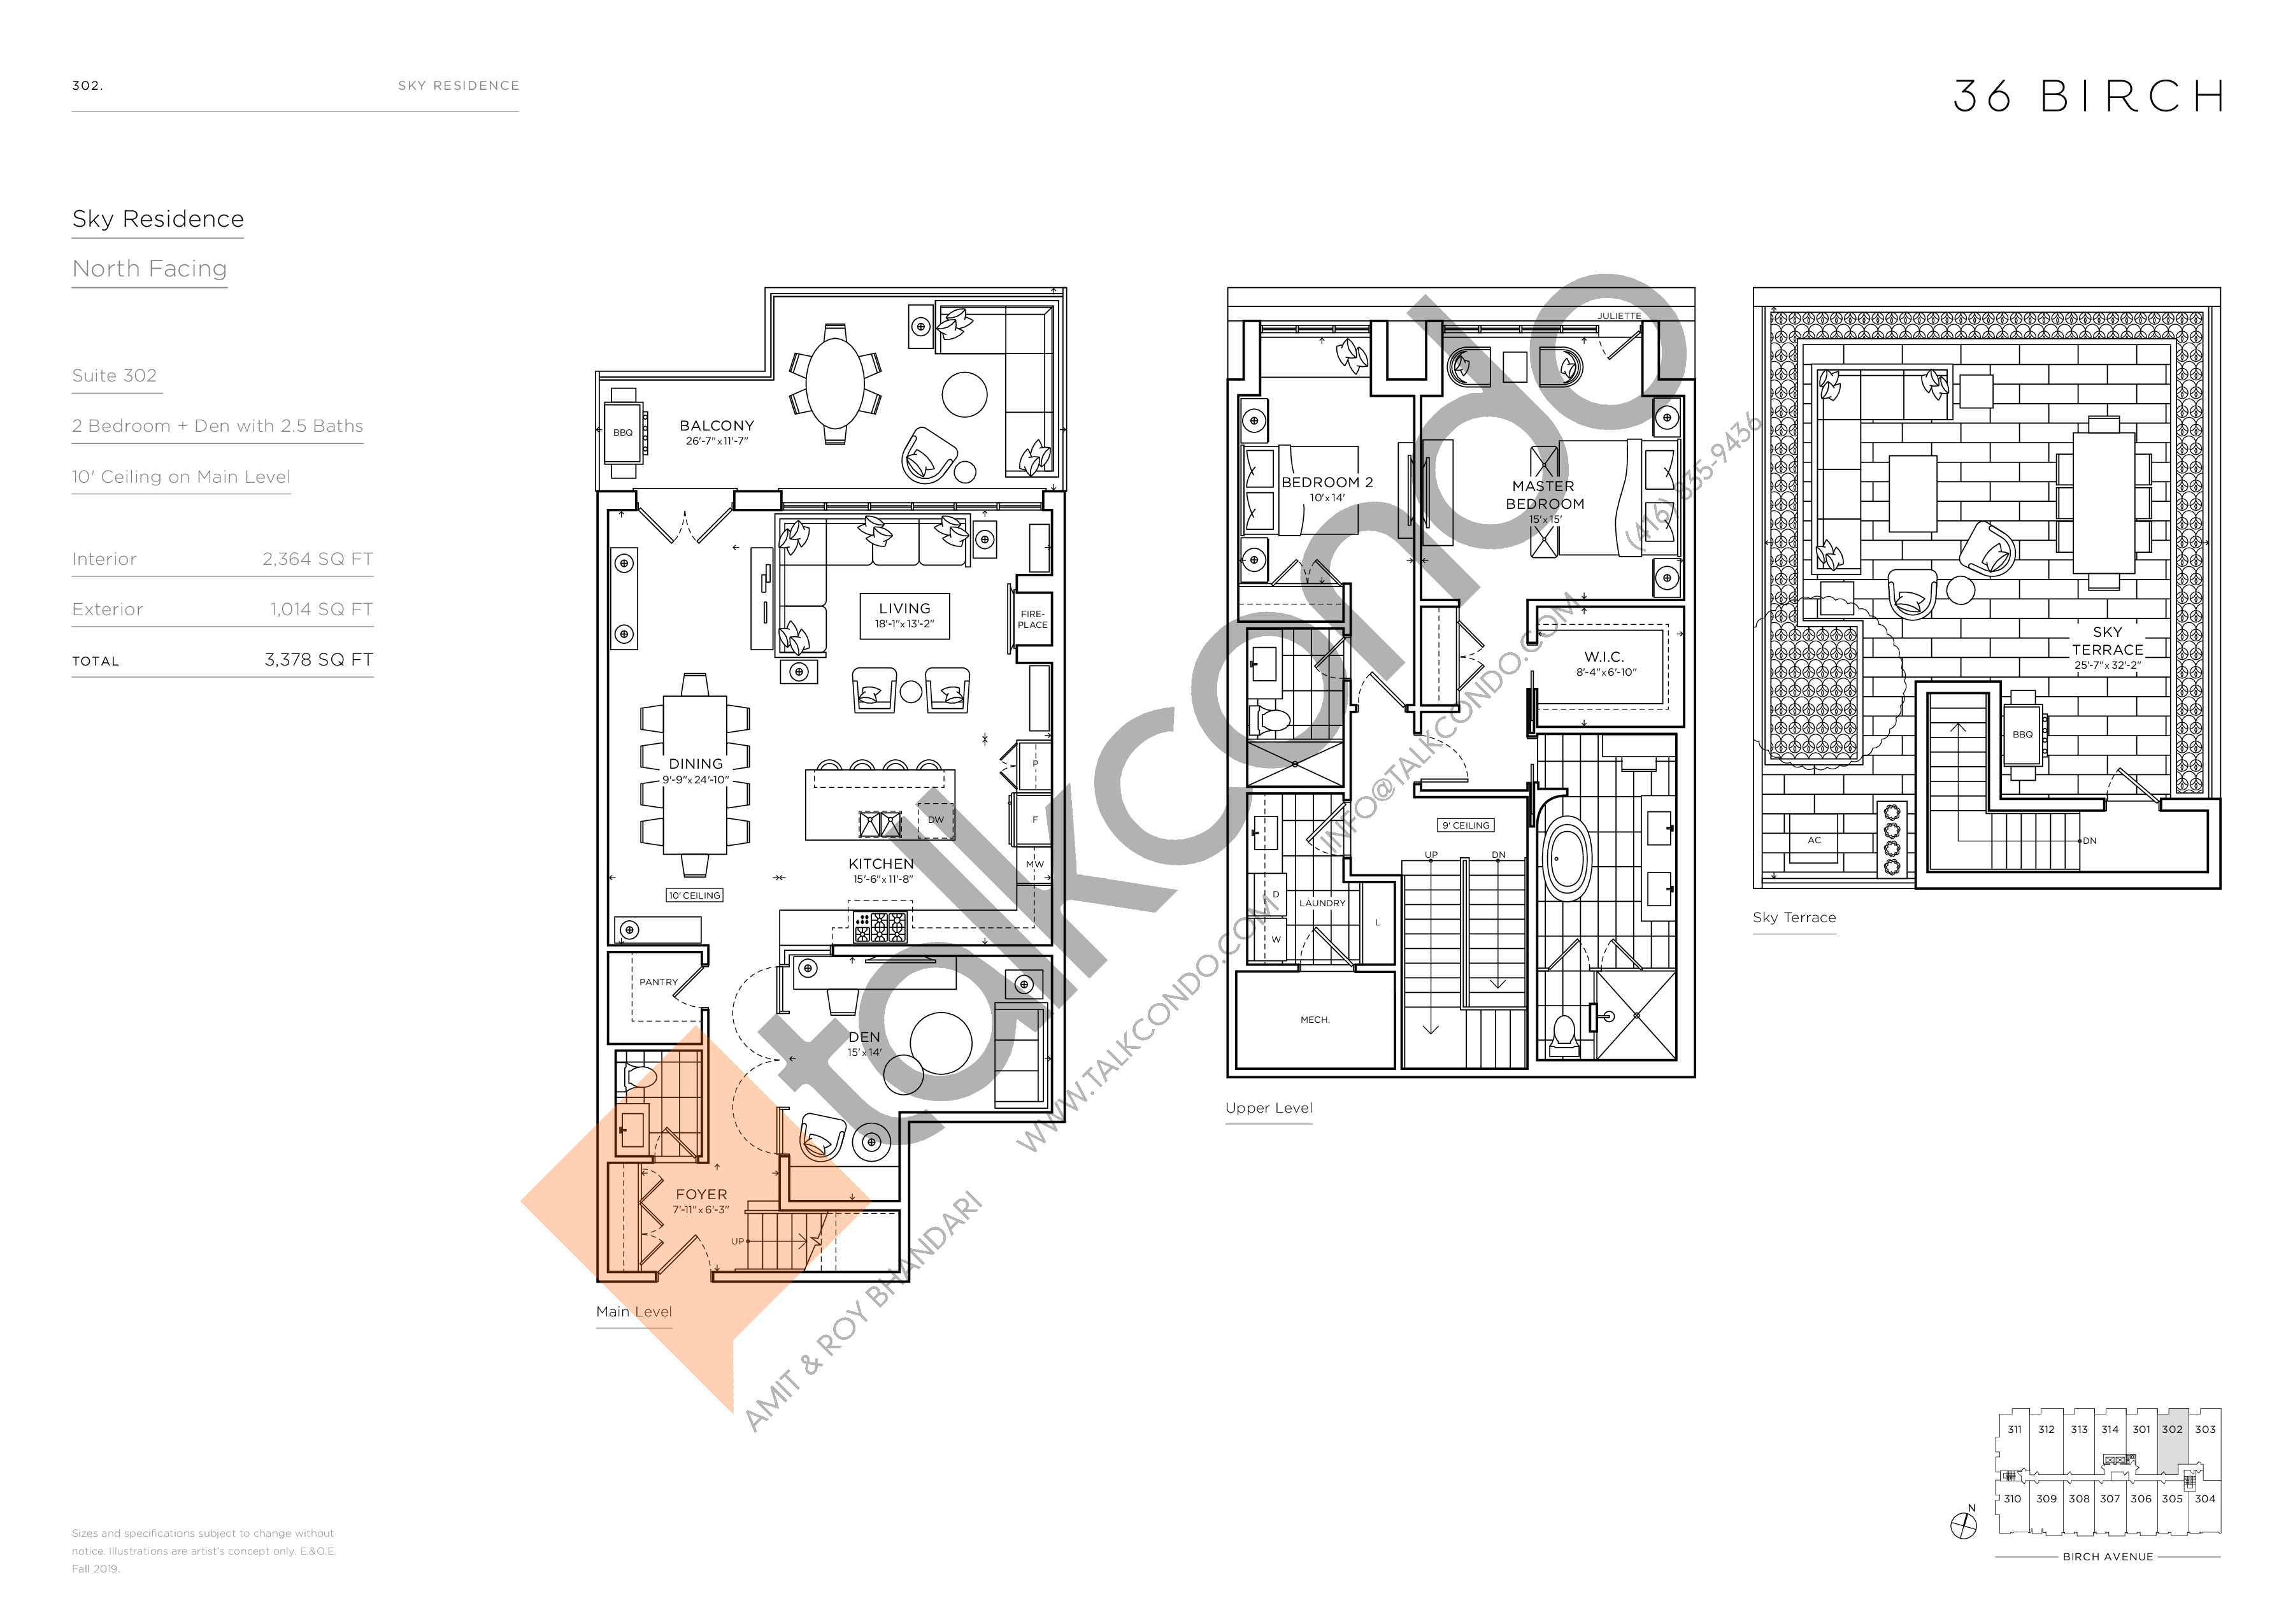 302 - Sky Residence Floor Plan at 36 Birch Condos - 2364 sq.ft